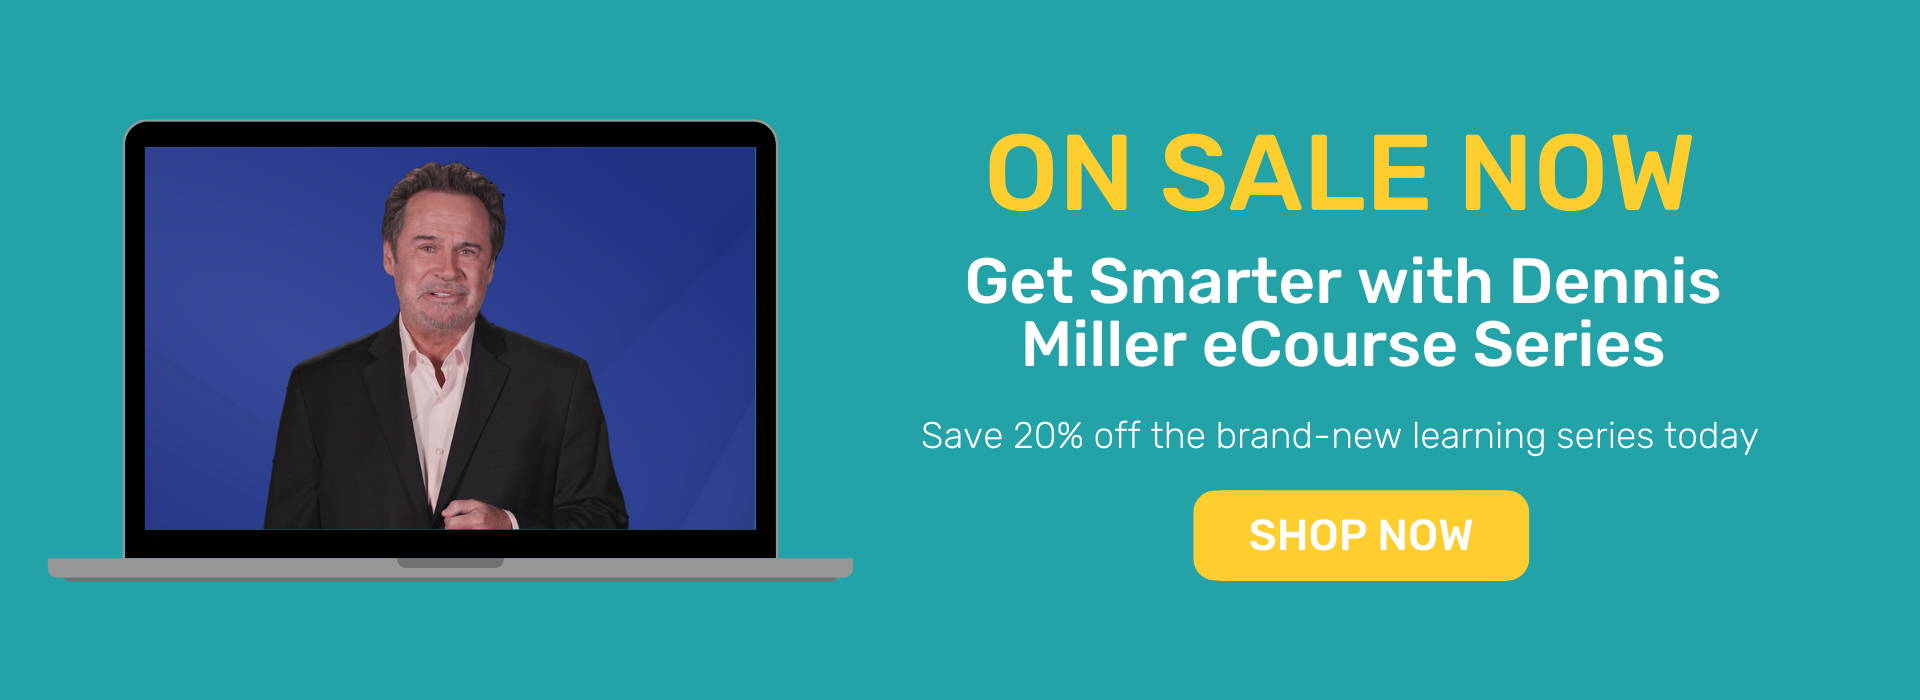 Get Smarter with Dennis Miller series now on sale